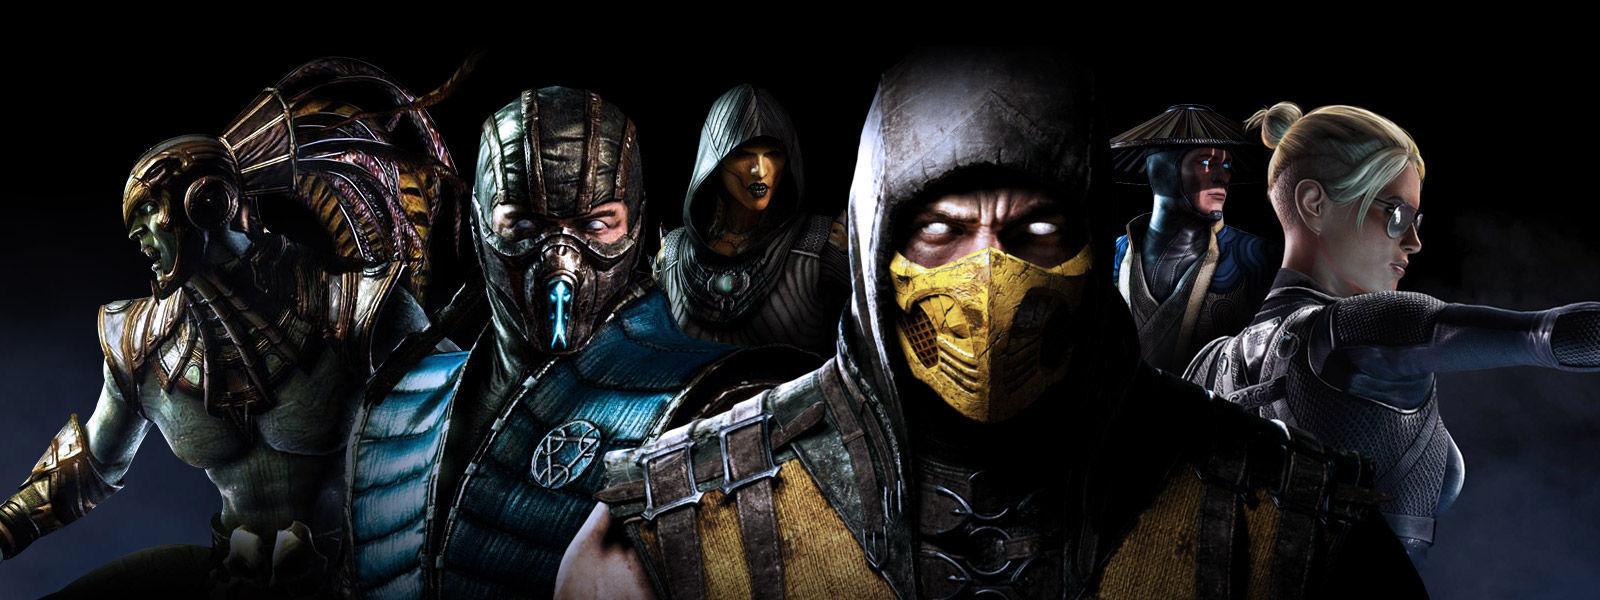 2224 - ¿Cuánto sabes de Mortal Kombat?